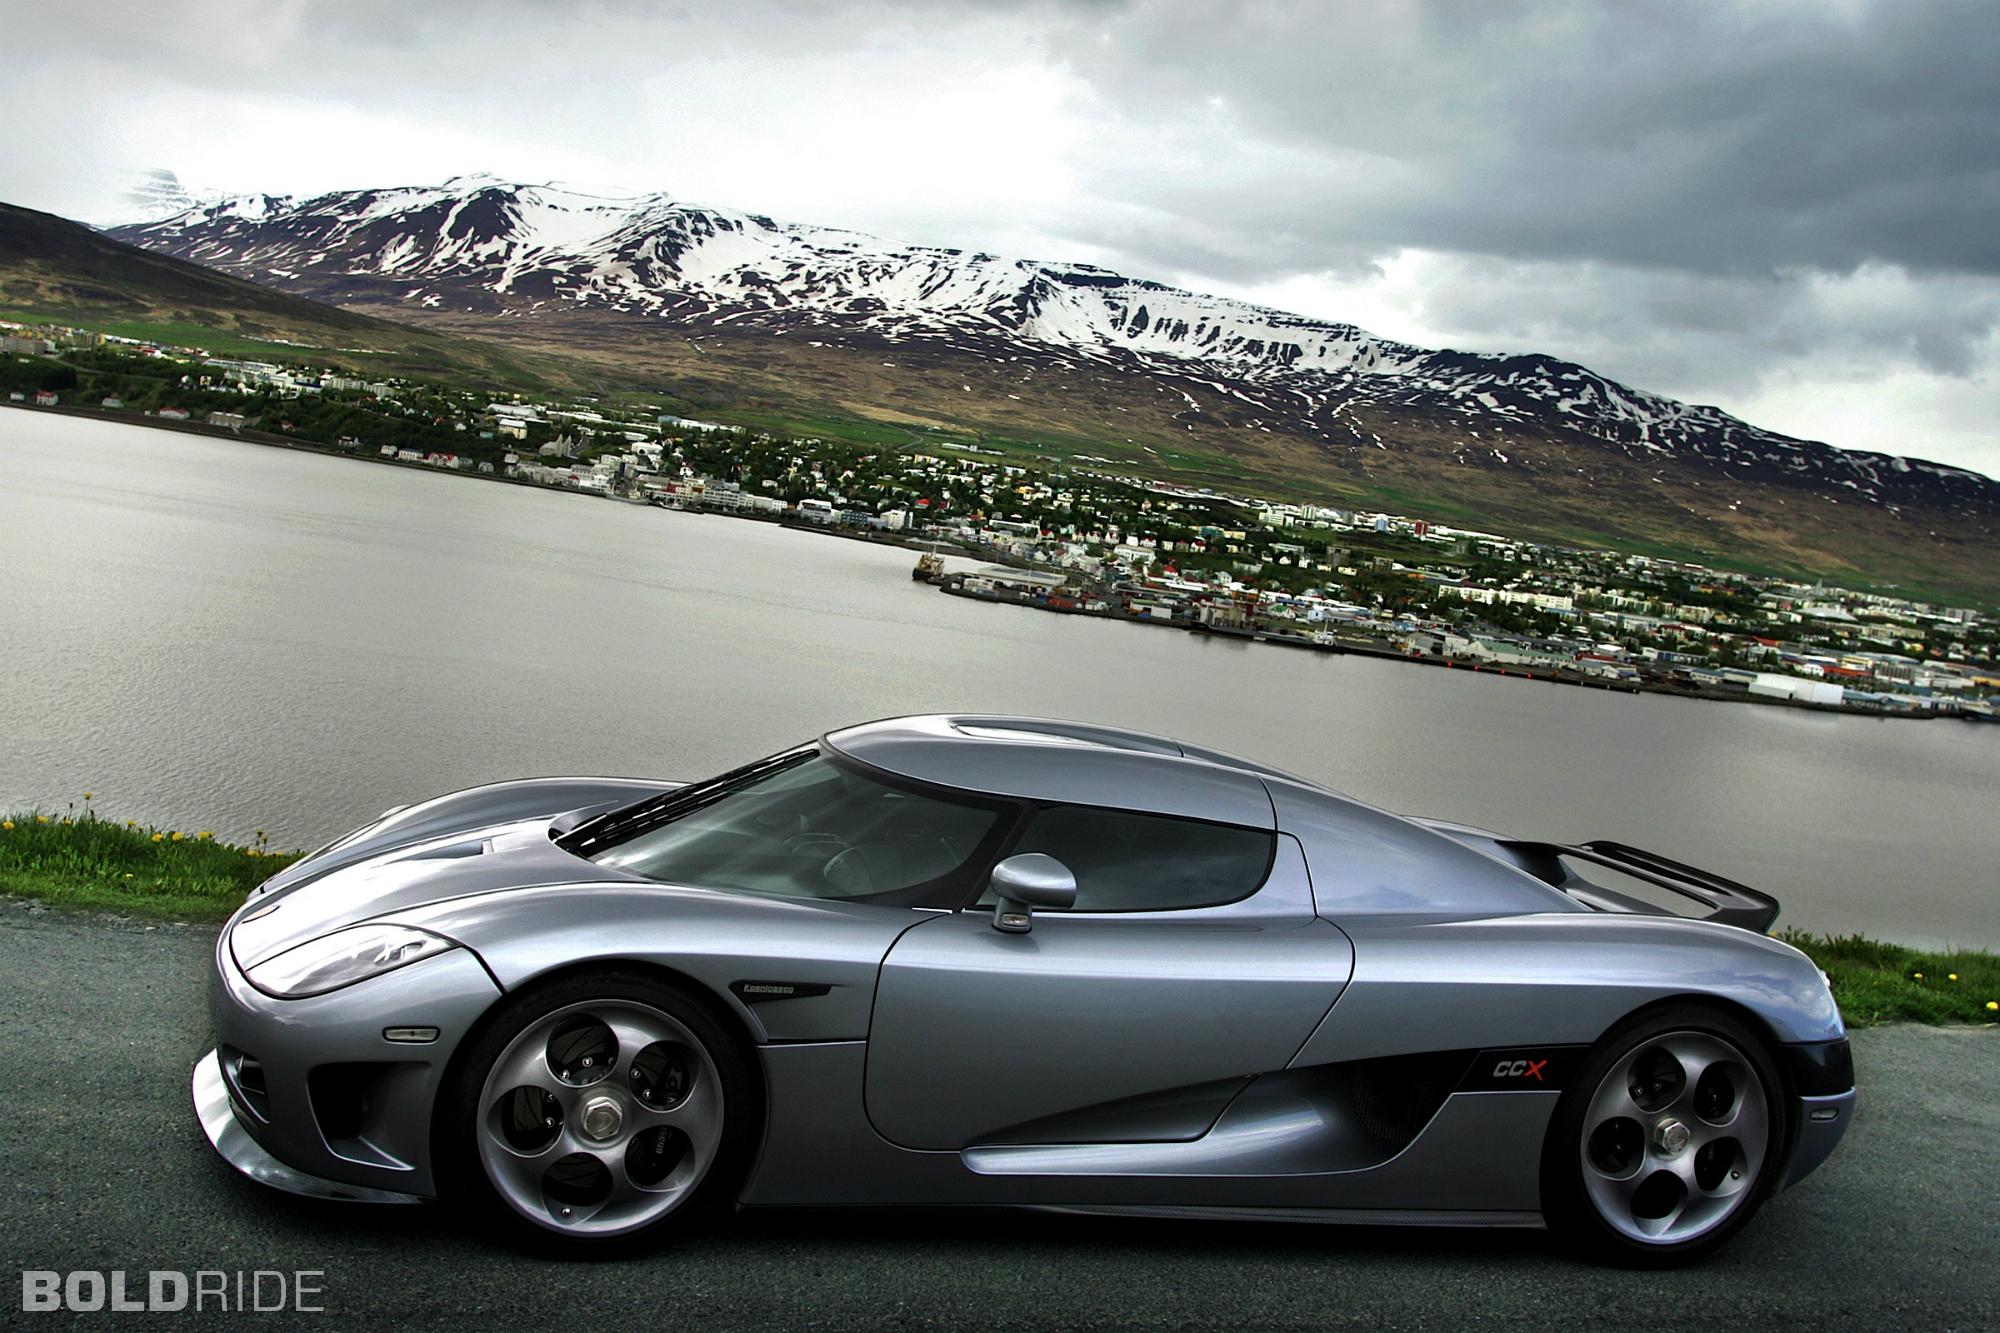 2012 Koenigsegg CC